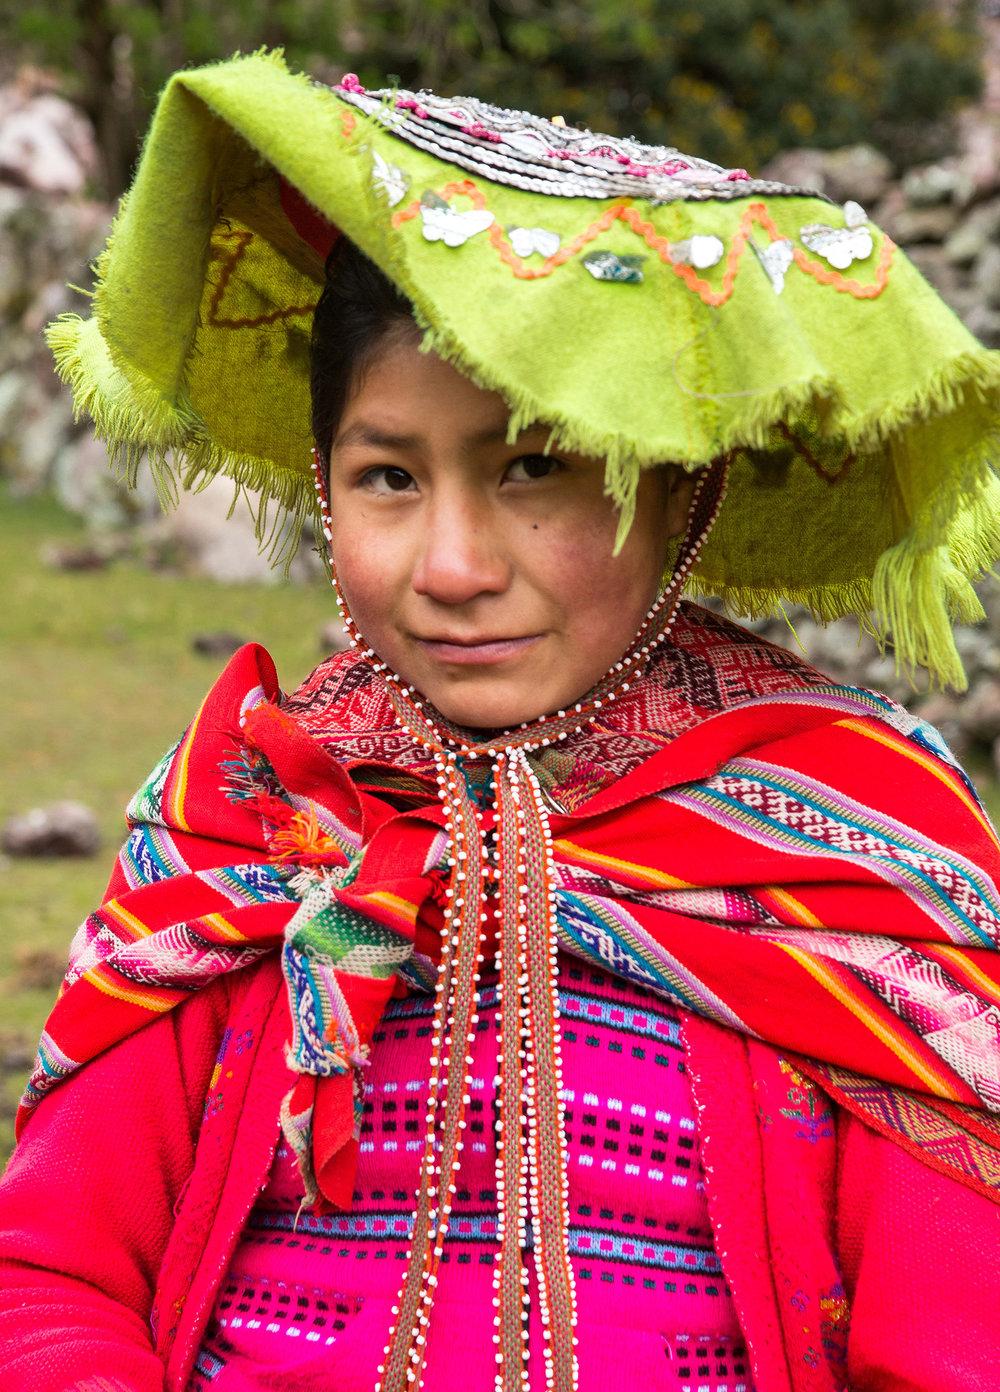 Huachuasi-Peru-3053.jpg